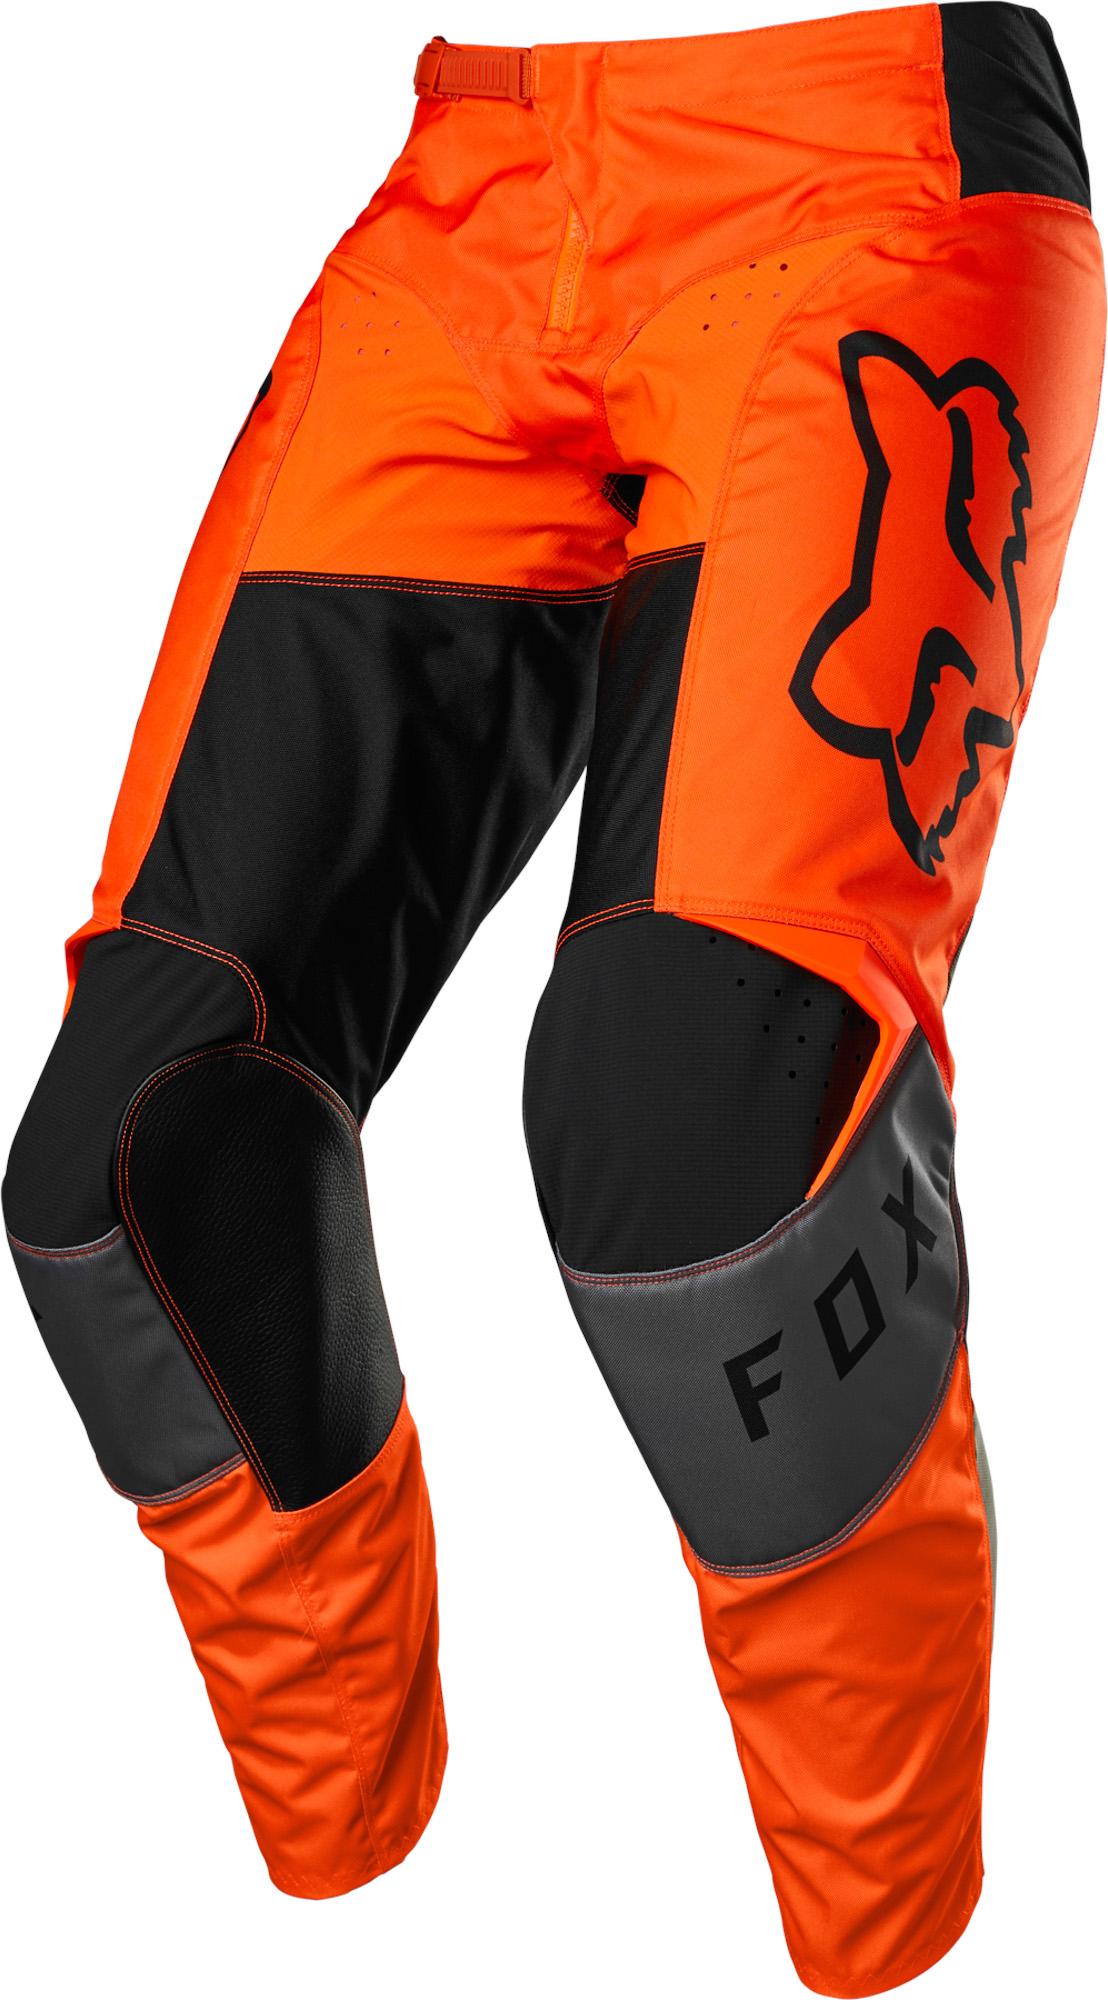 FOX 180 Lux Pant - Fluo Orange MX22